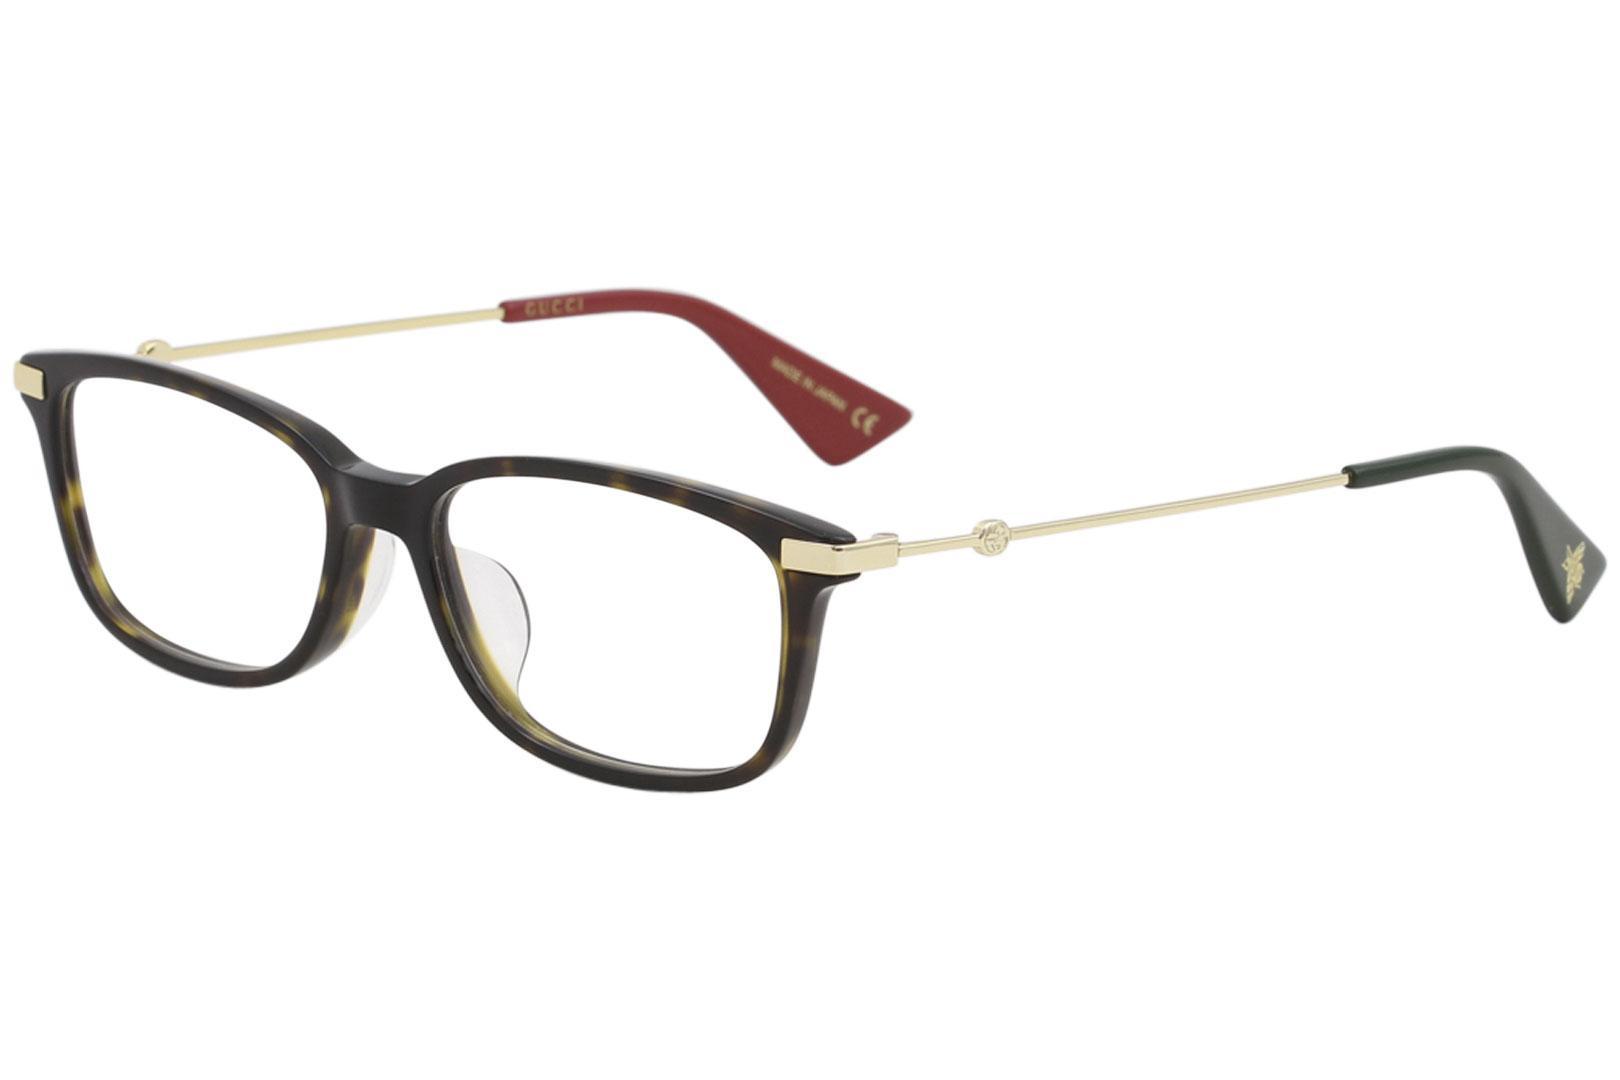 fe5df32e8a42 Gucci Women s Eyeglasses GG0112OA GG 0112 OA Urban Full Rim Optical Frame